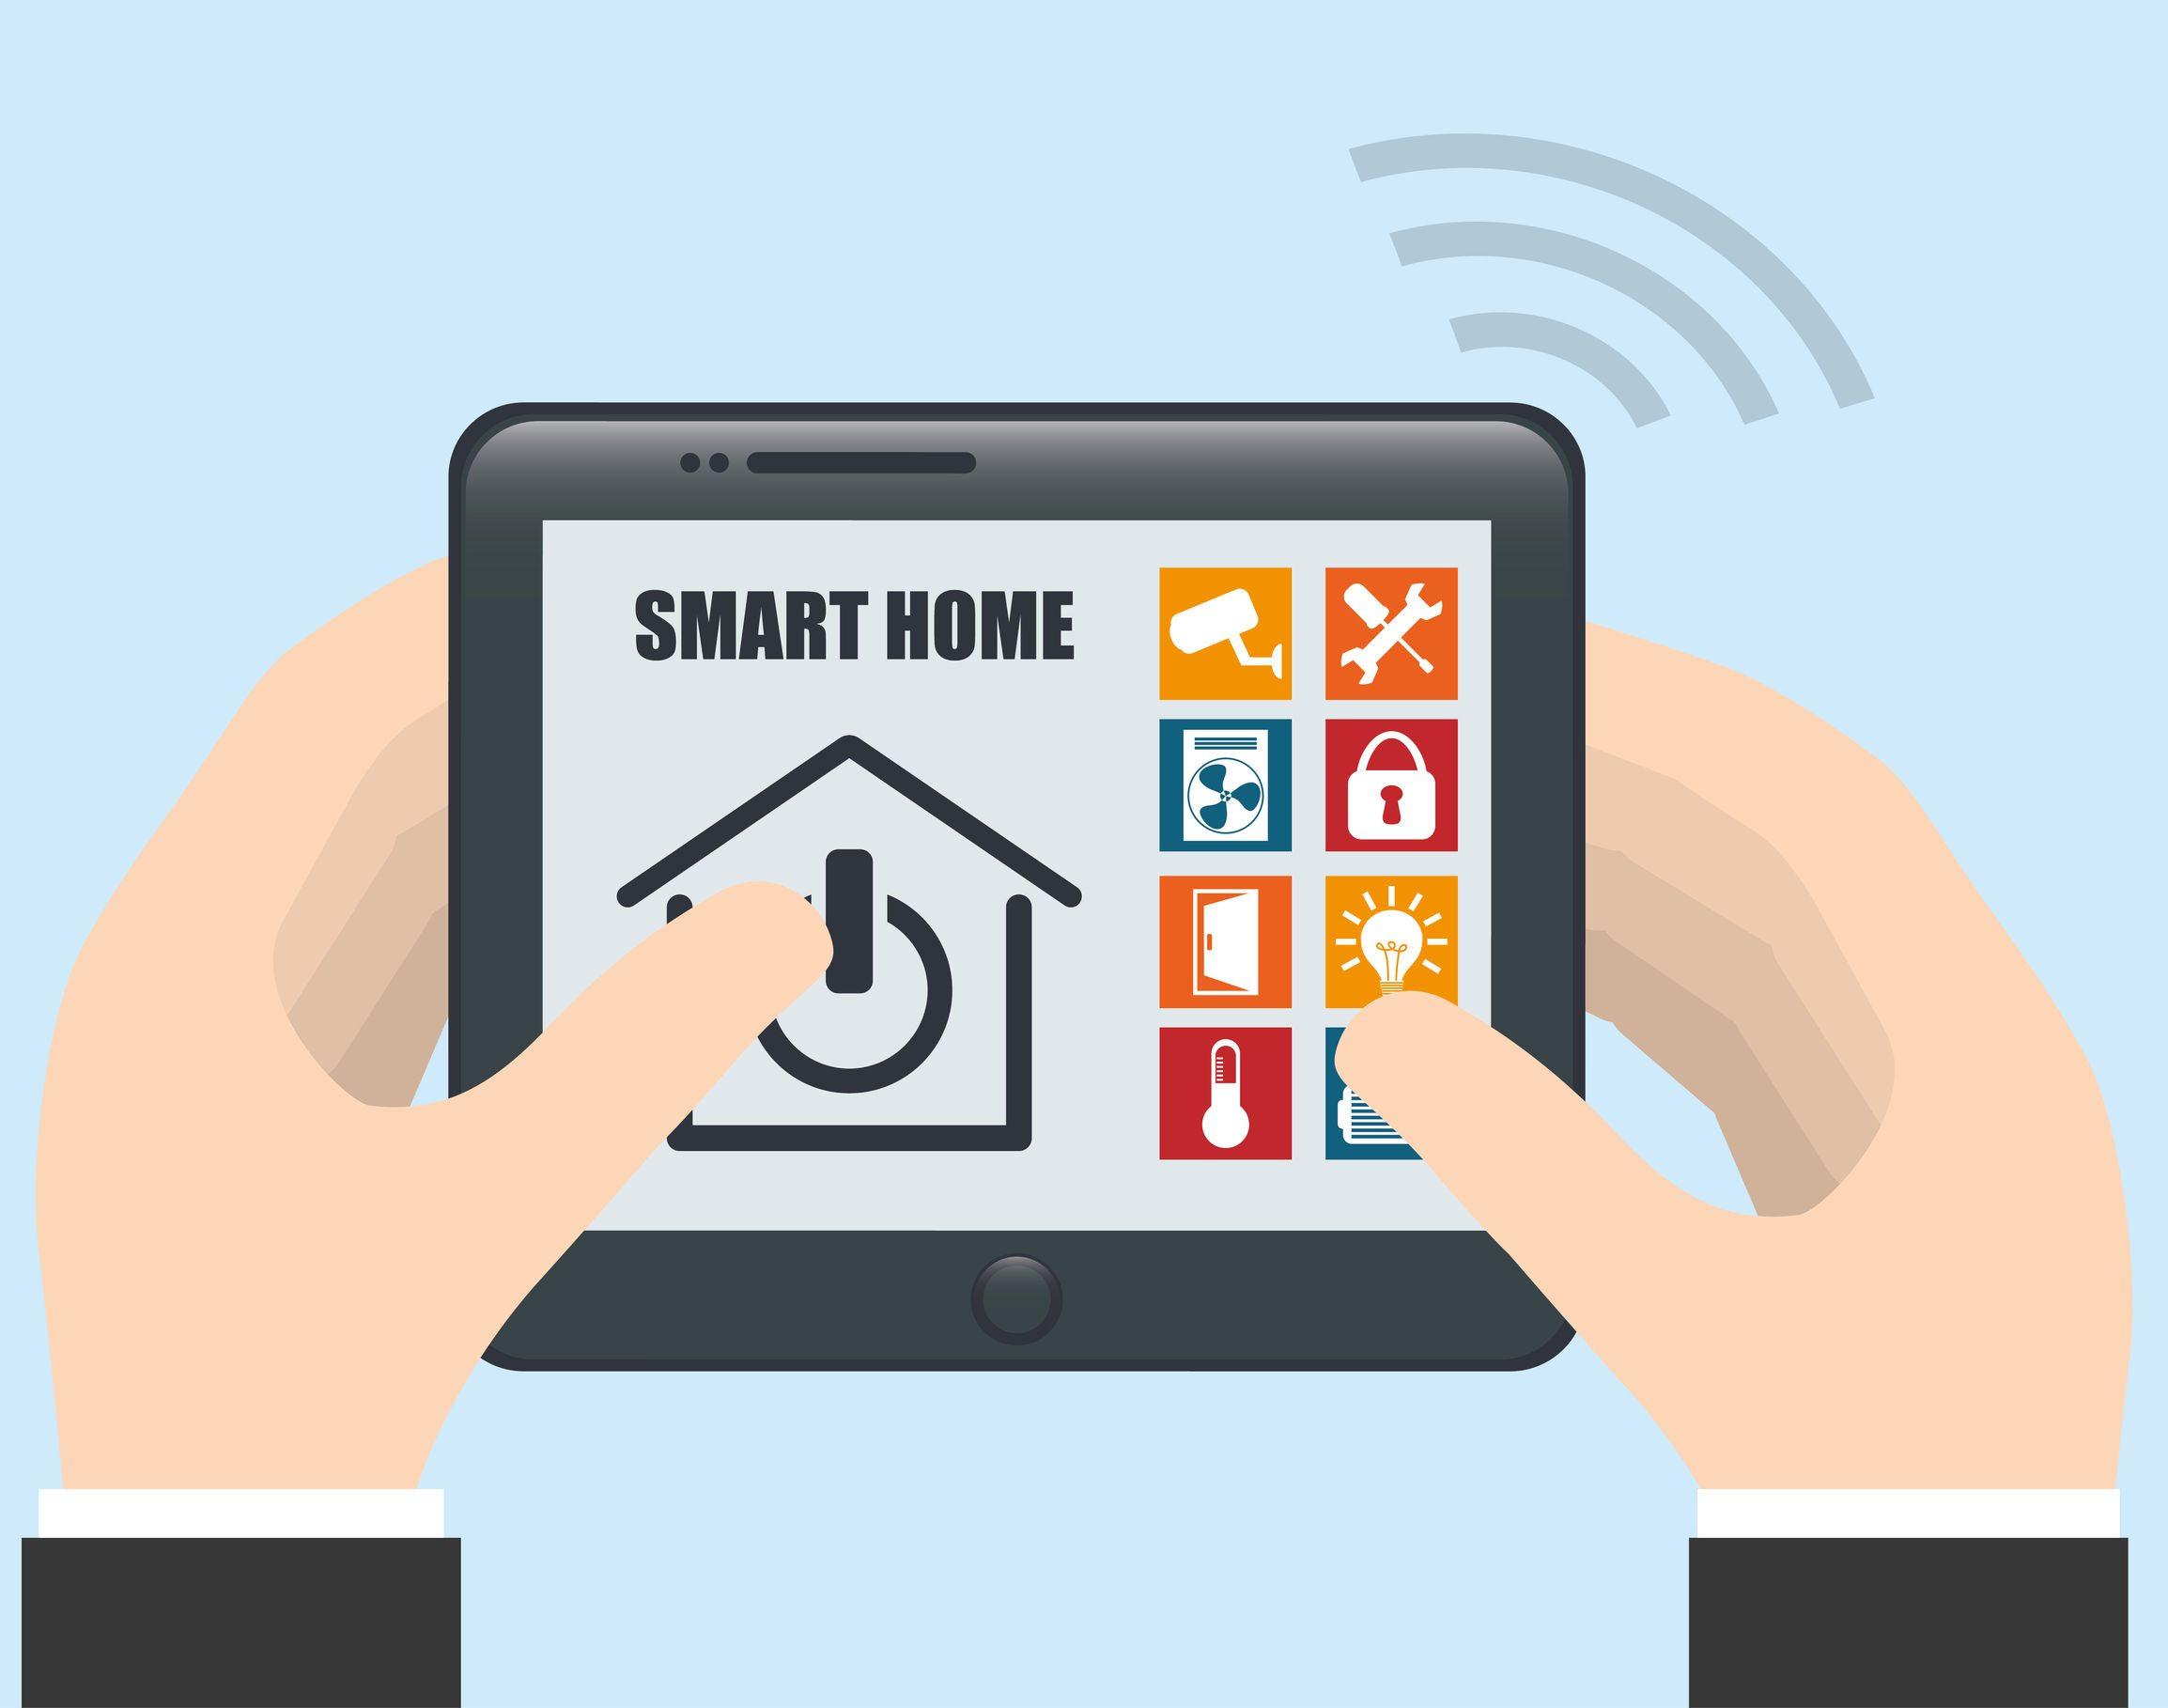 kpn launches smart home services with deutsche telekom